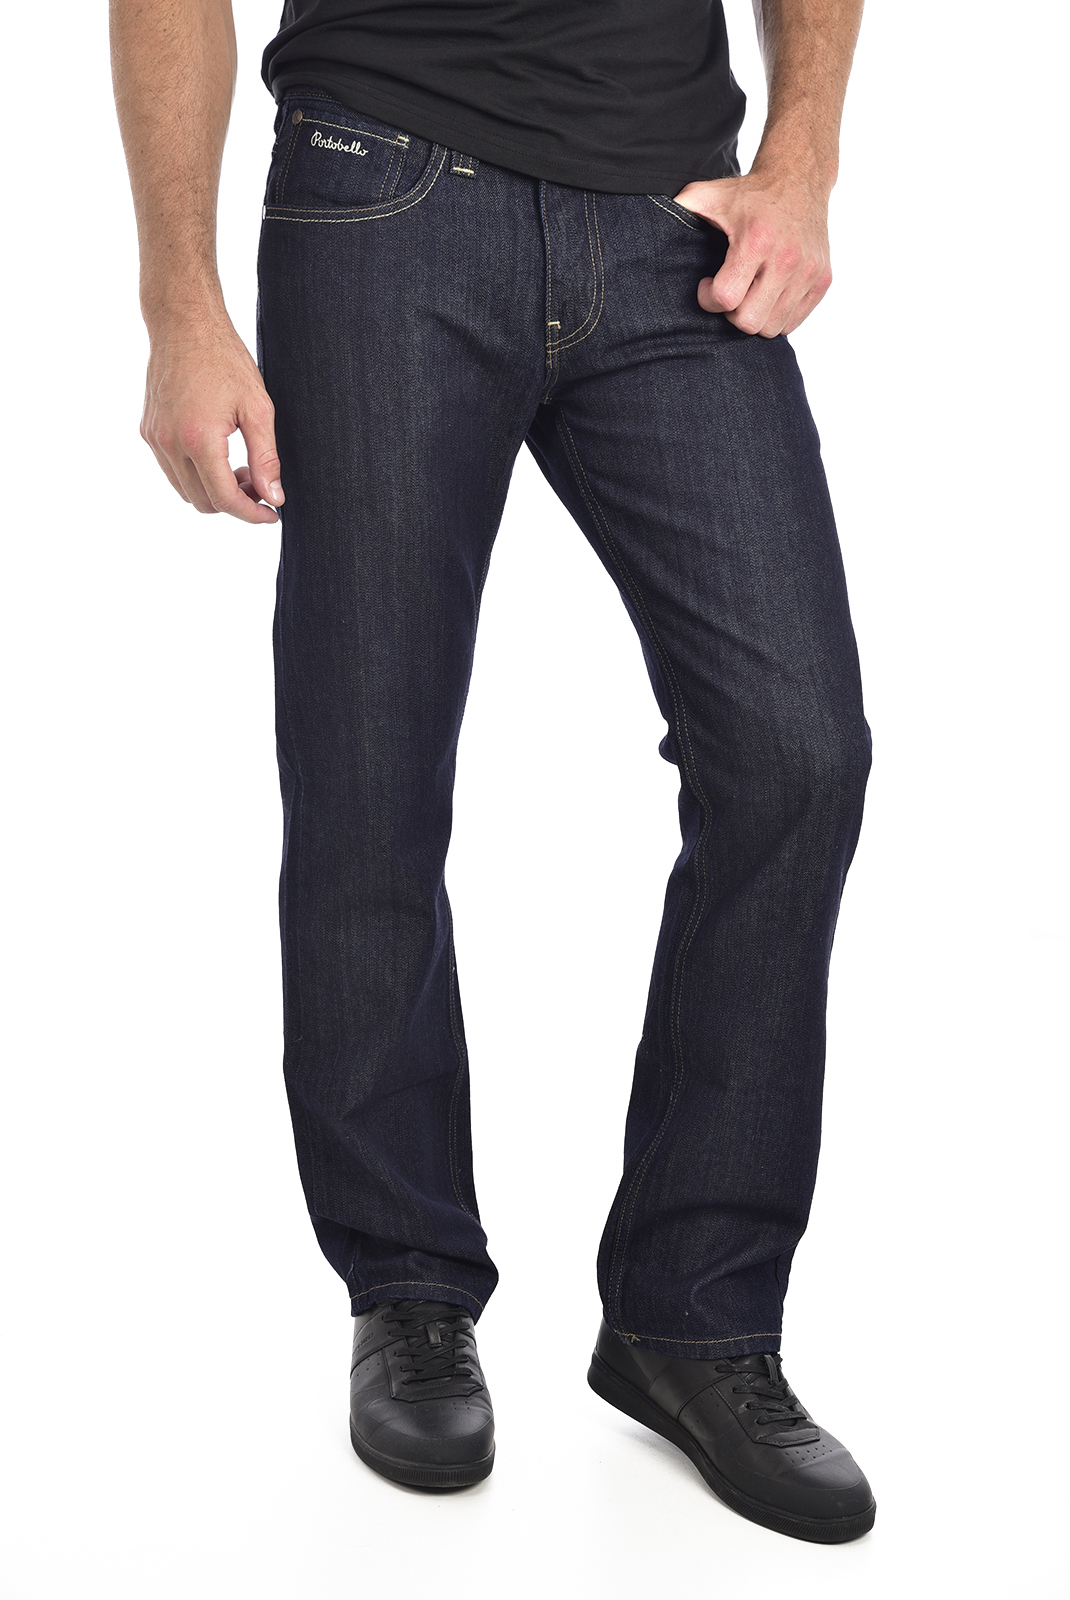 Jeans  Pepe jeans PM202037 WINSOR bleu